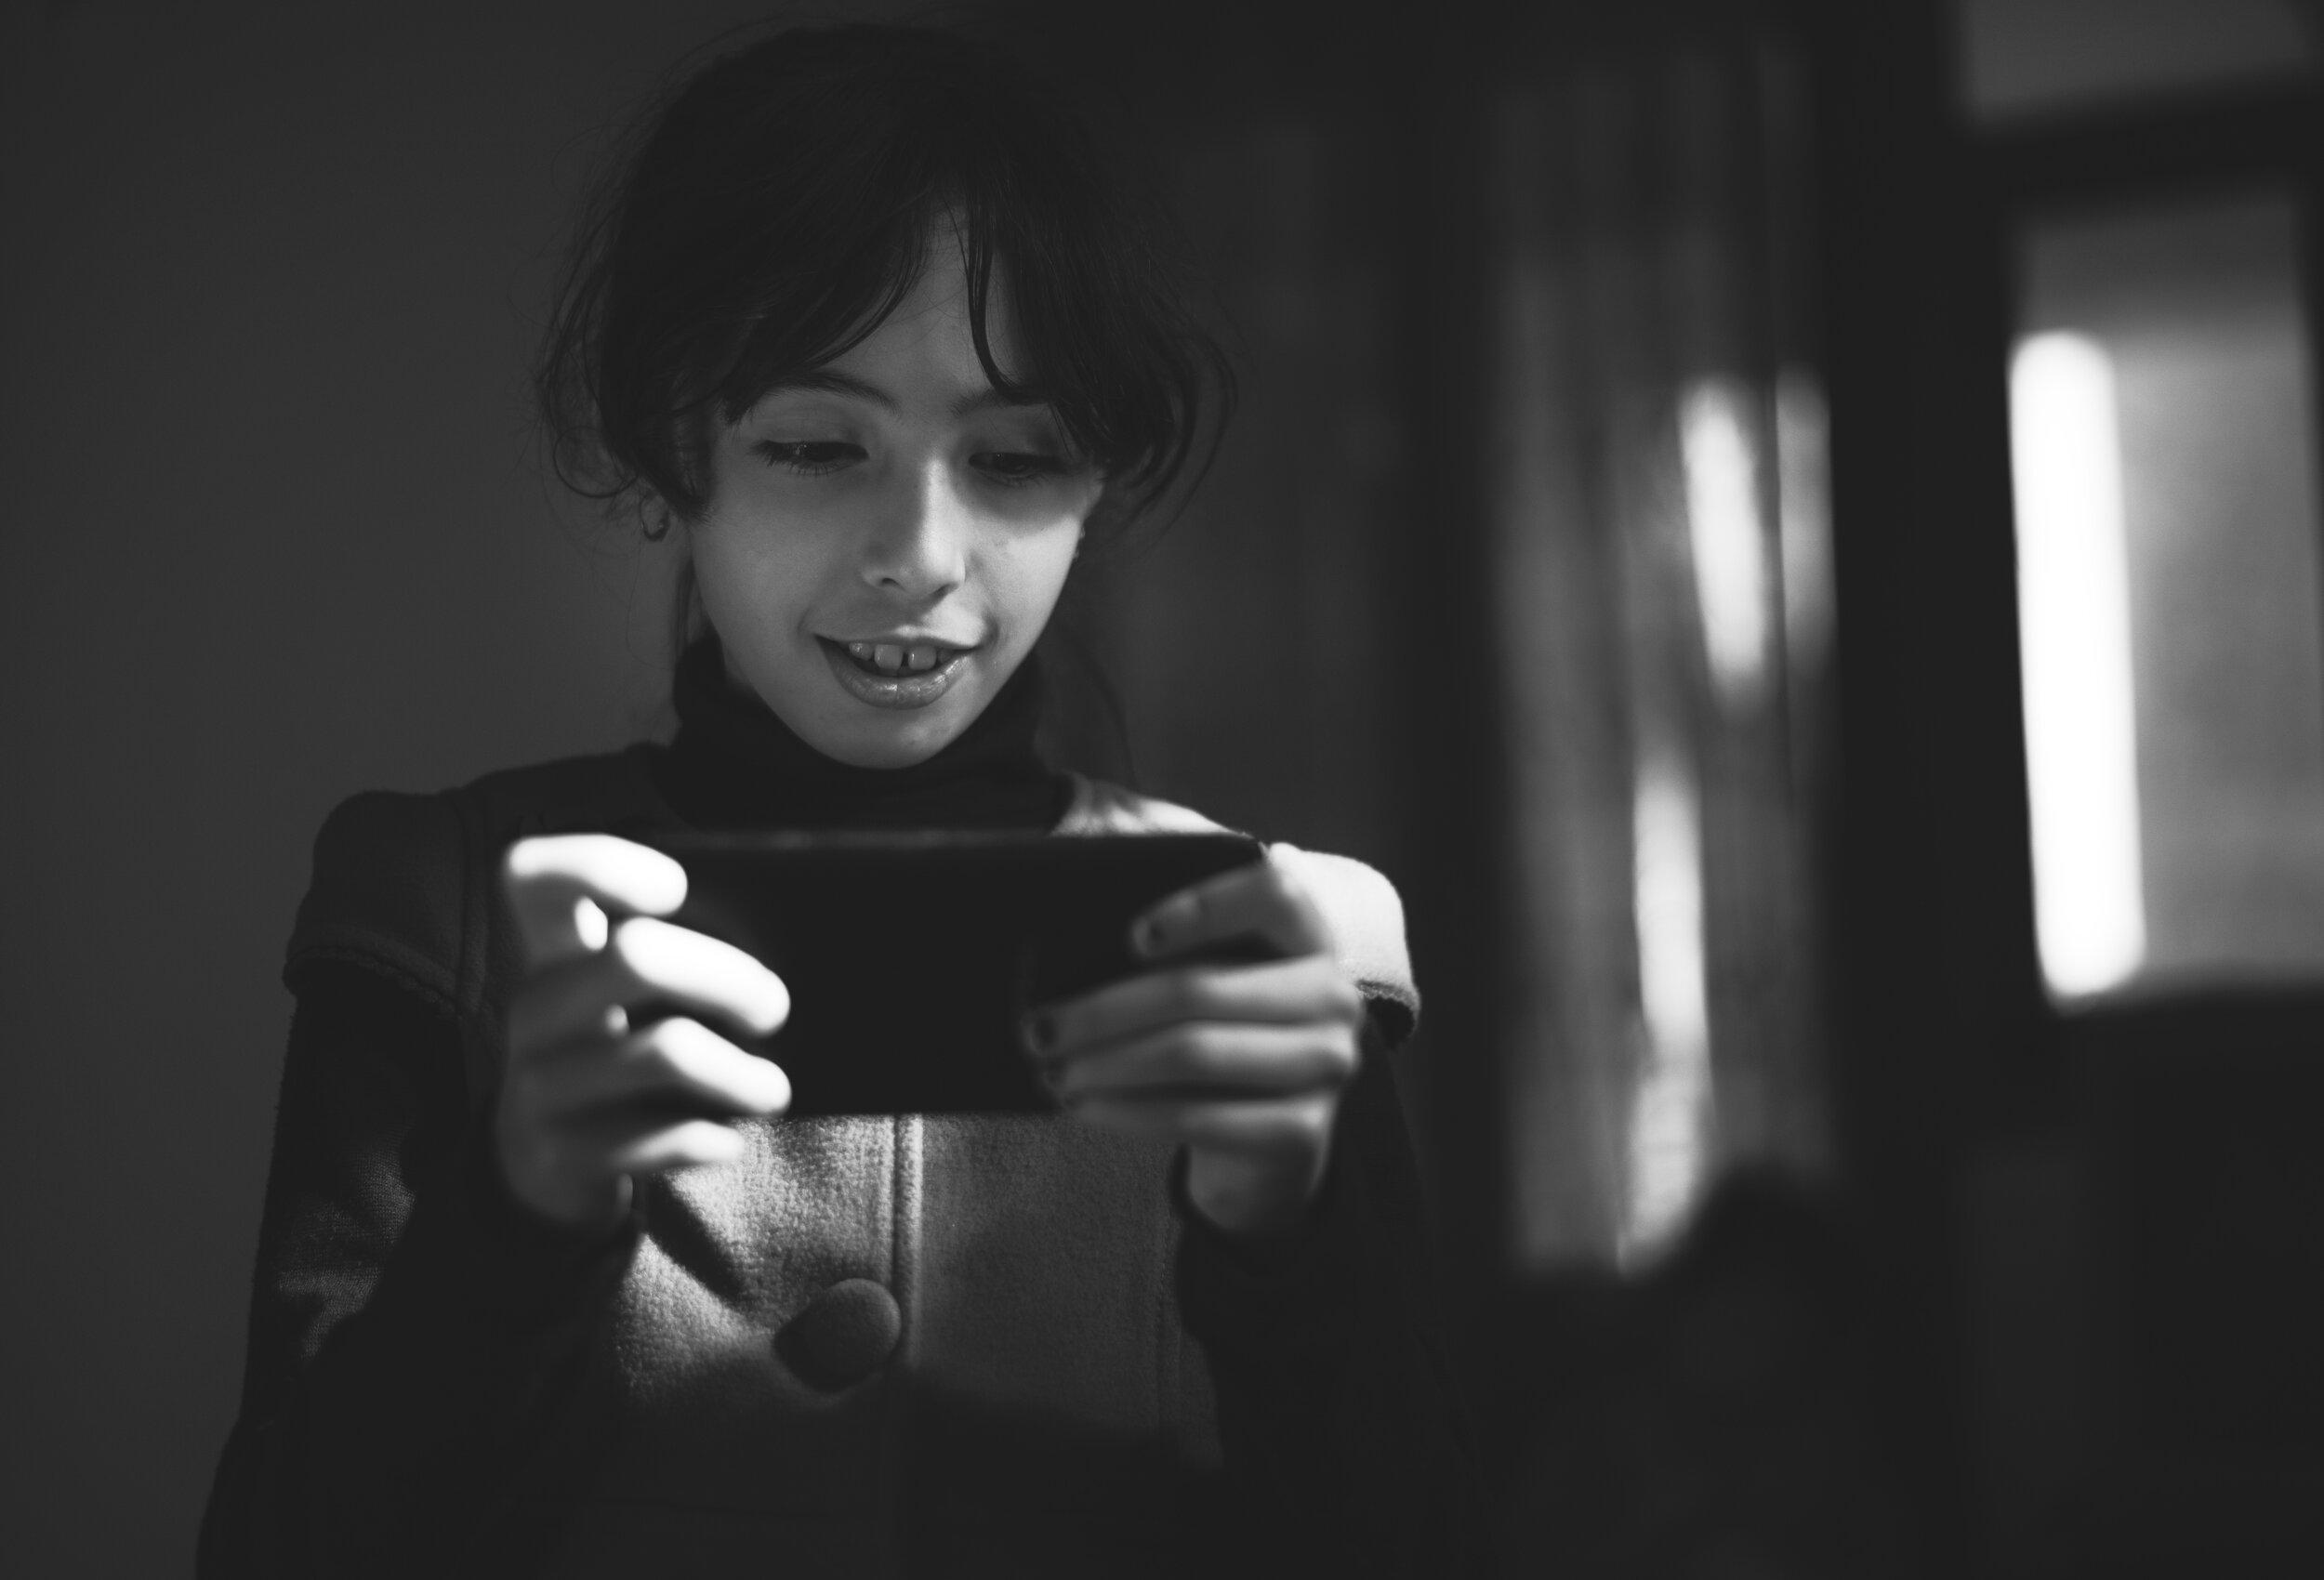 adorable-black-and-white-blur-1701278.jpg